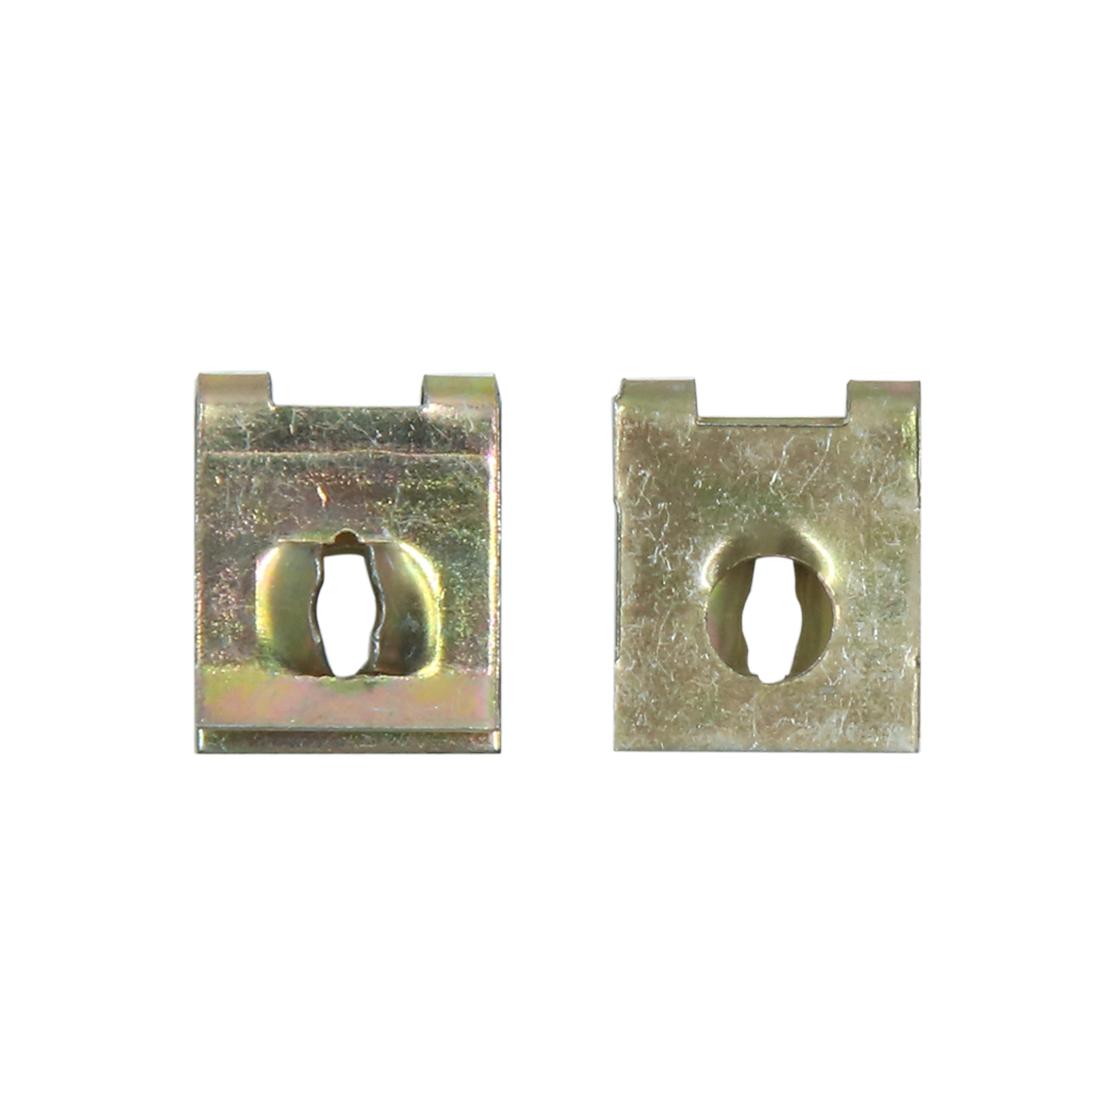 4pcs 5mm Dia Car Screw U-Clips Rivets Door Panel Retainers Fasteners 15 x 12mm - image 2 de 3